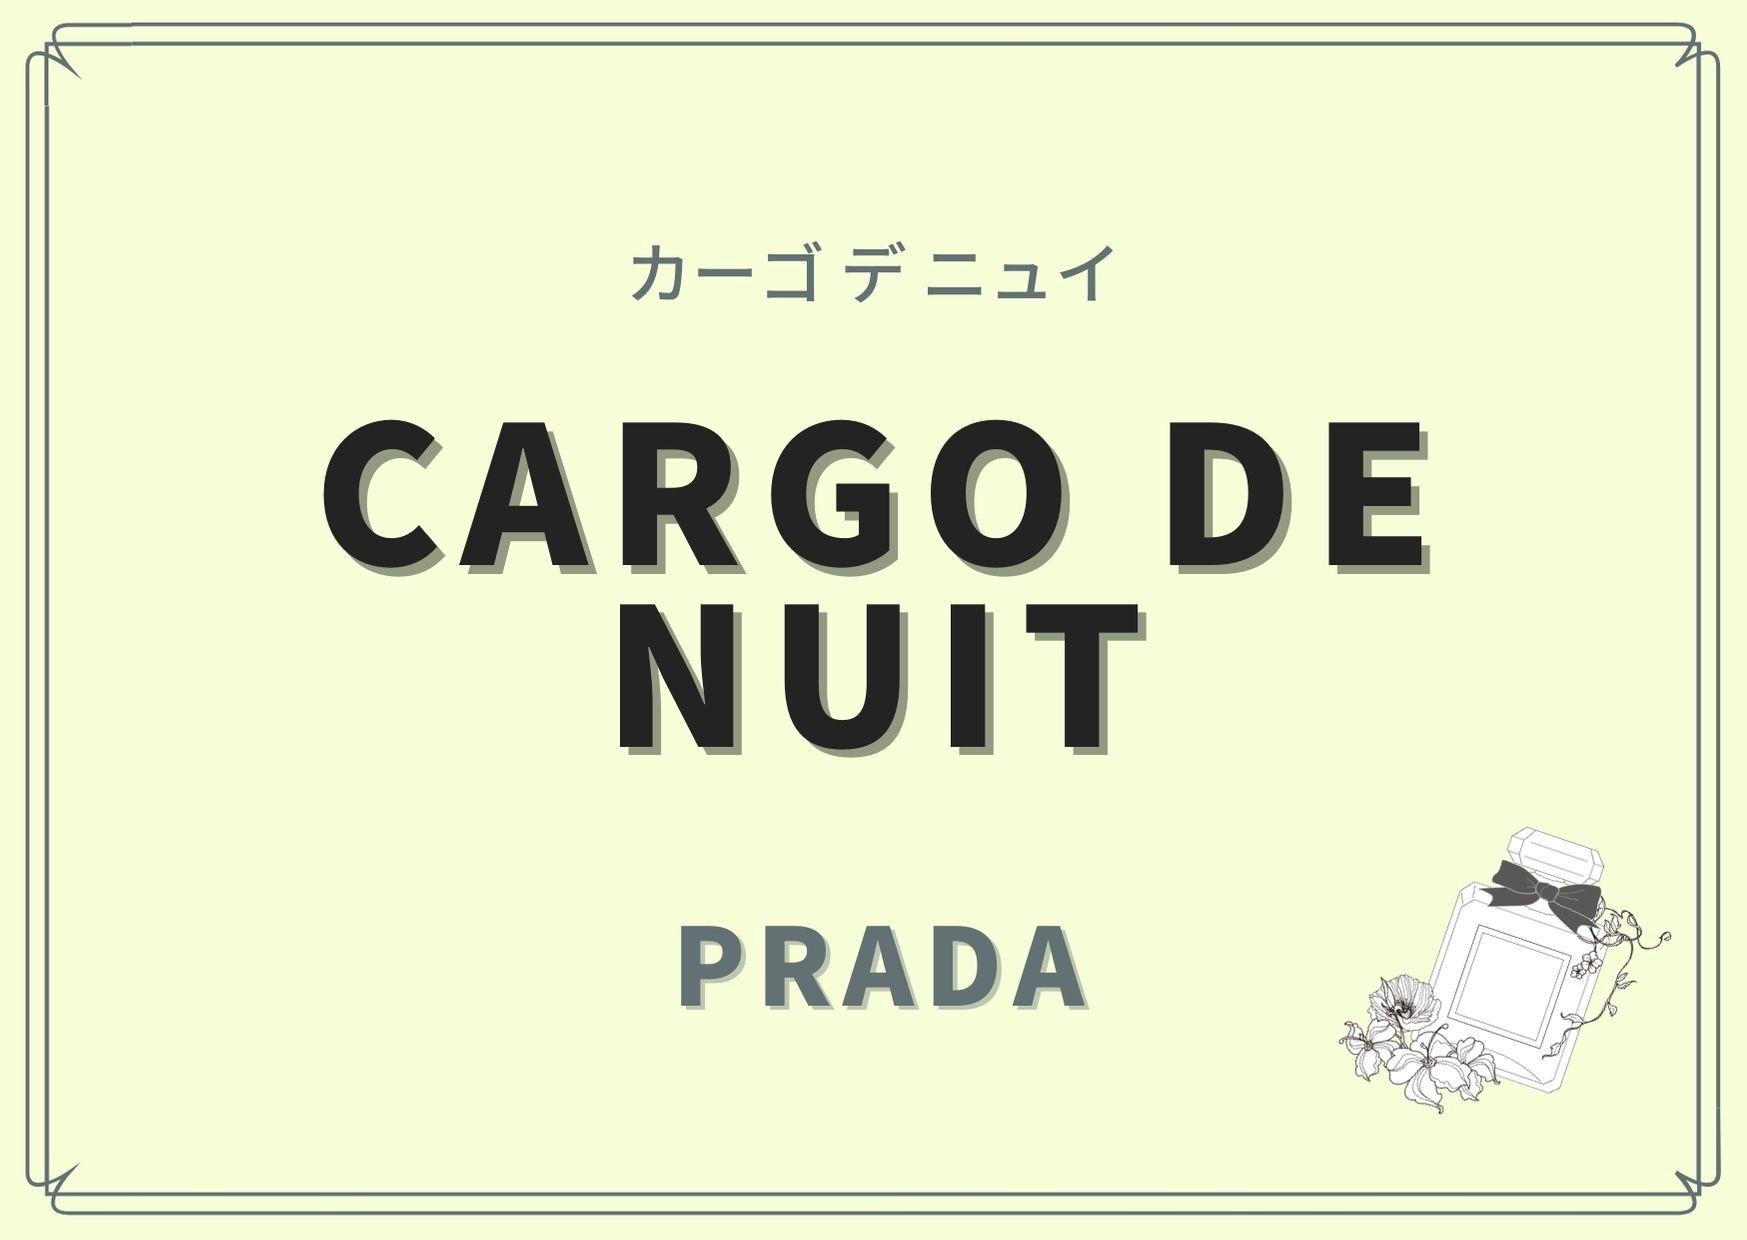 CARGO DE NUIT(カーゴ デ ニュイ)/PRADA(プラダ)